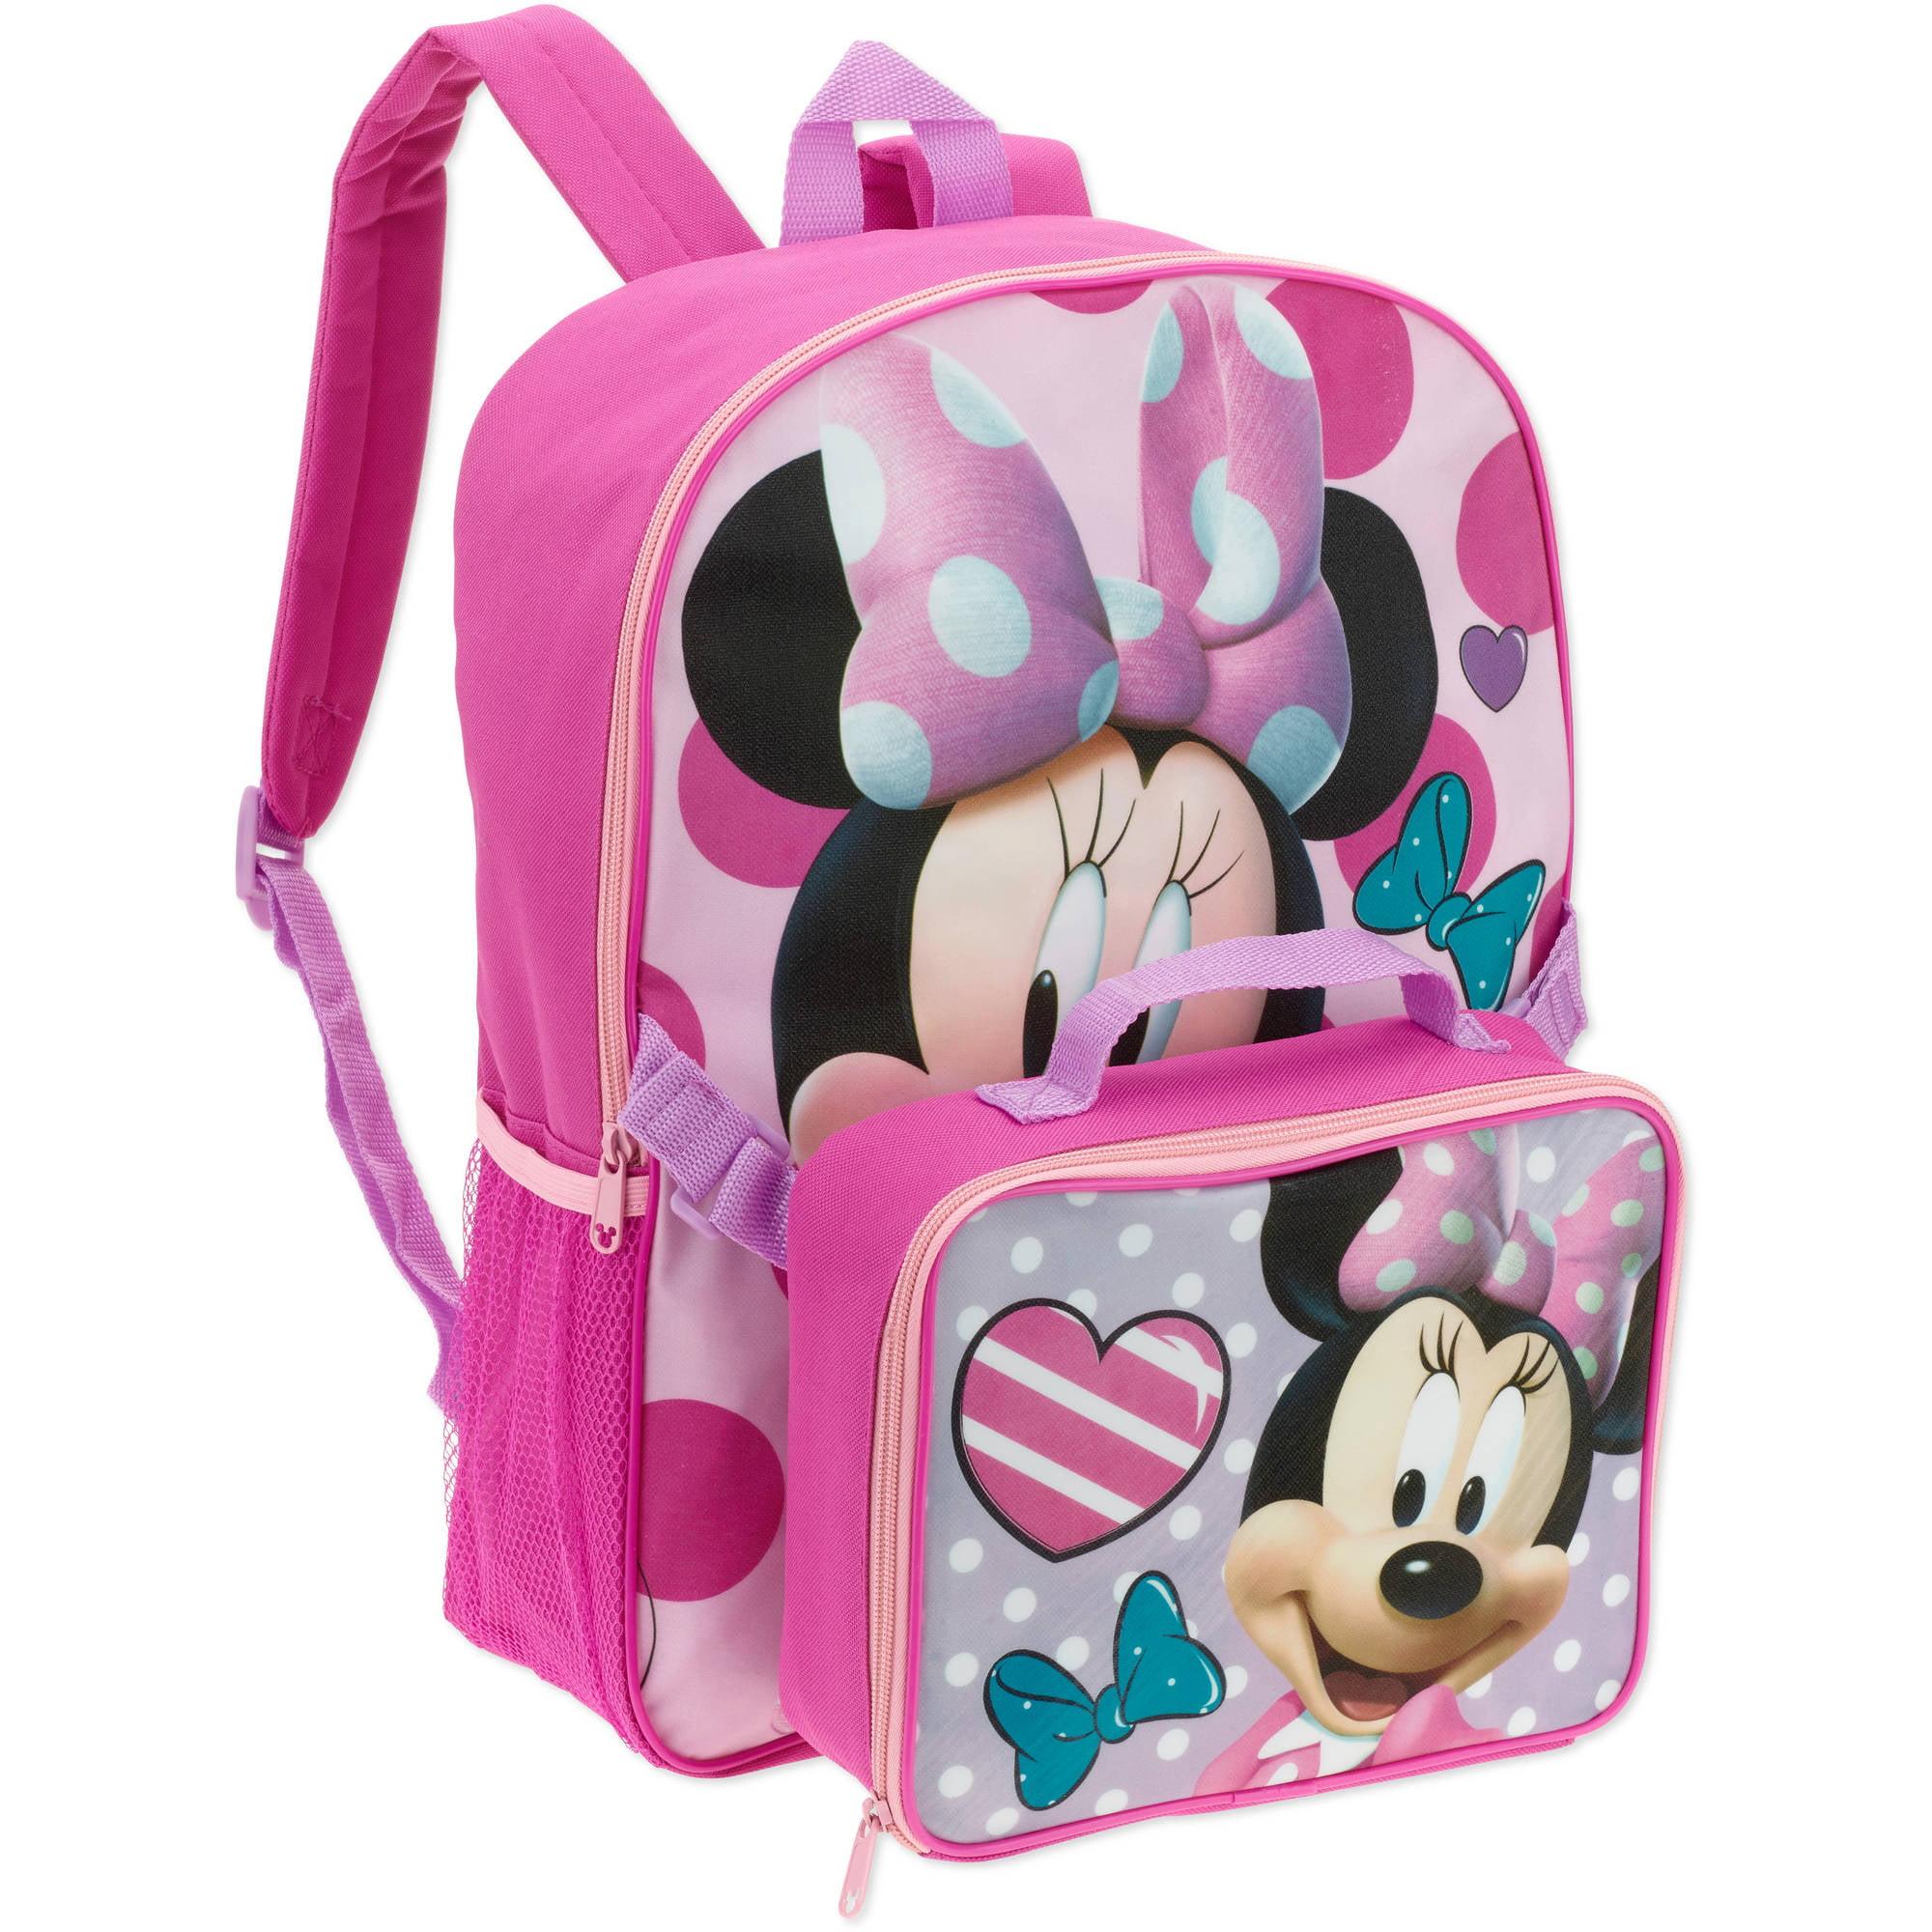 5504e8e736ff MINNIE MOUSE - Minnie Backpack with Lunch Box - Walmart.com